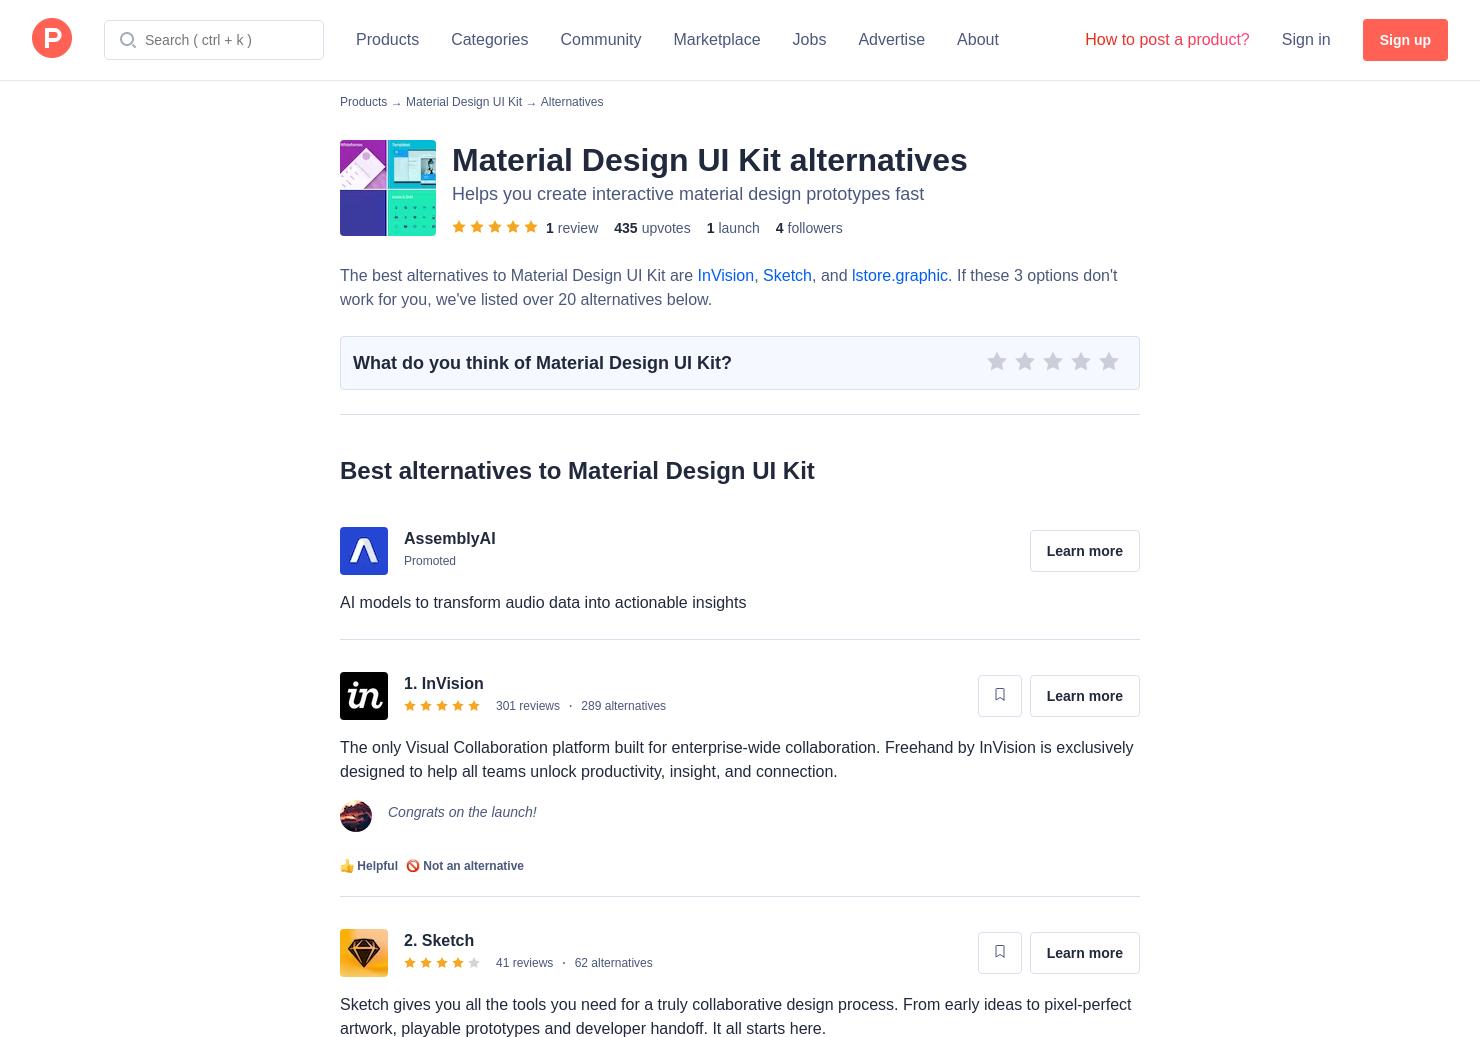 21 Alternatives to Material Design UI Kit   Product Hunt